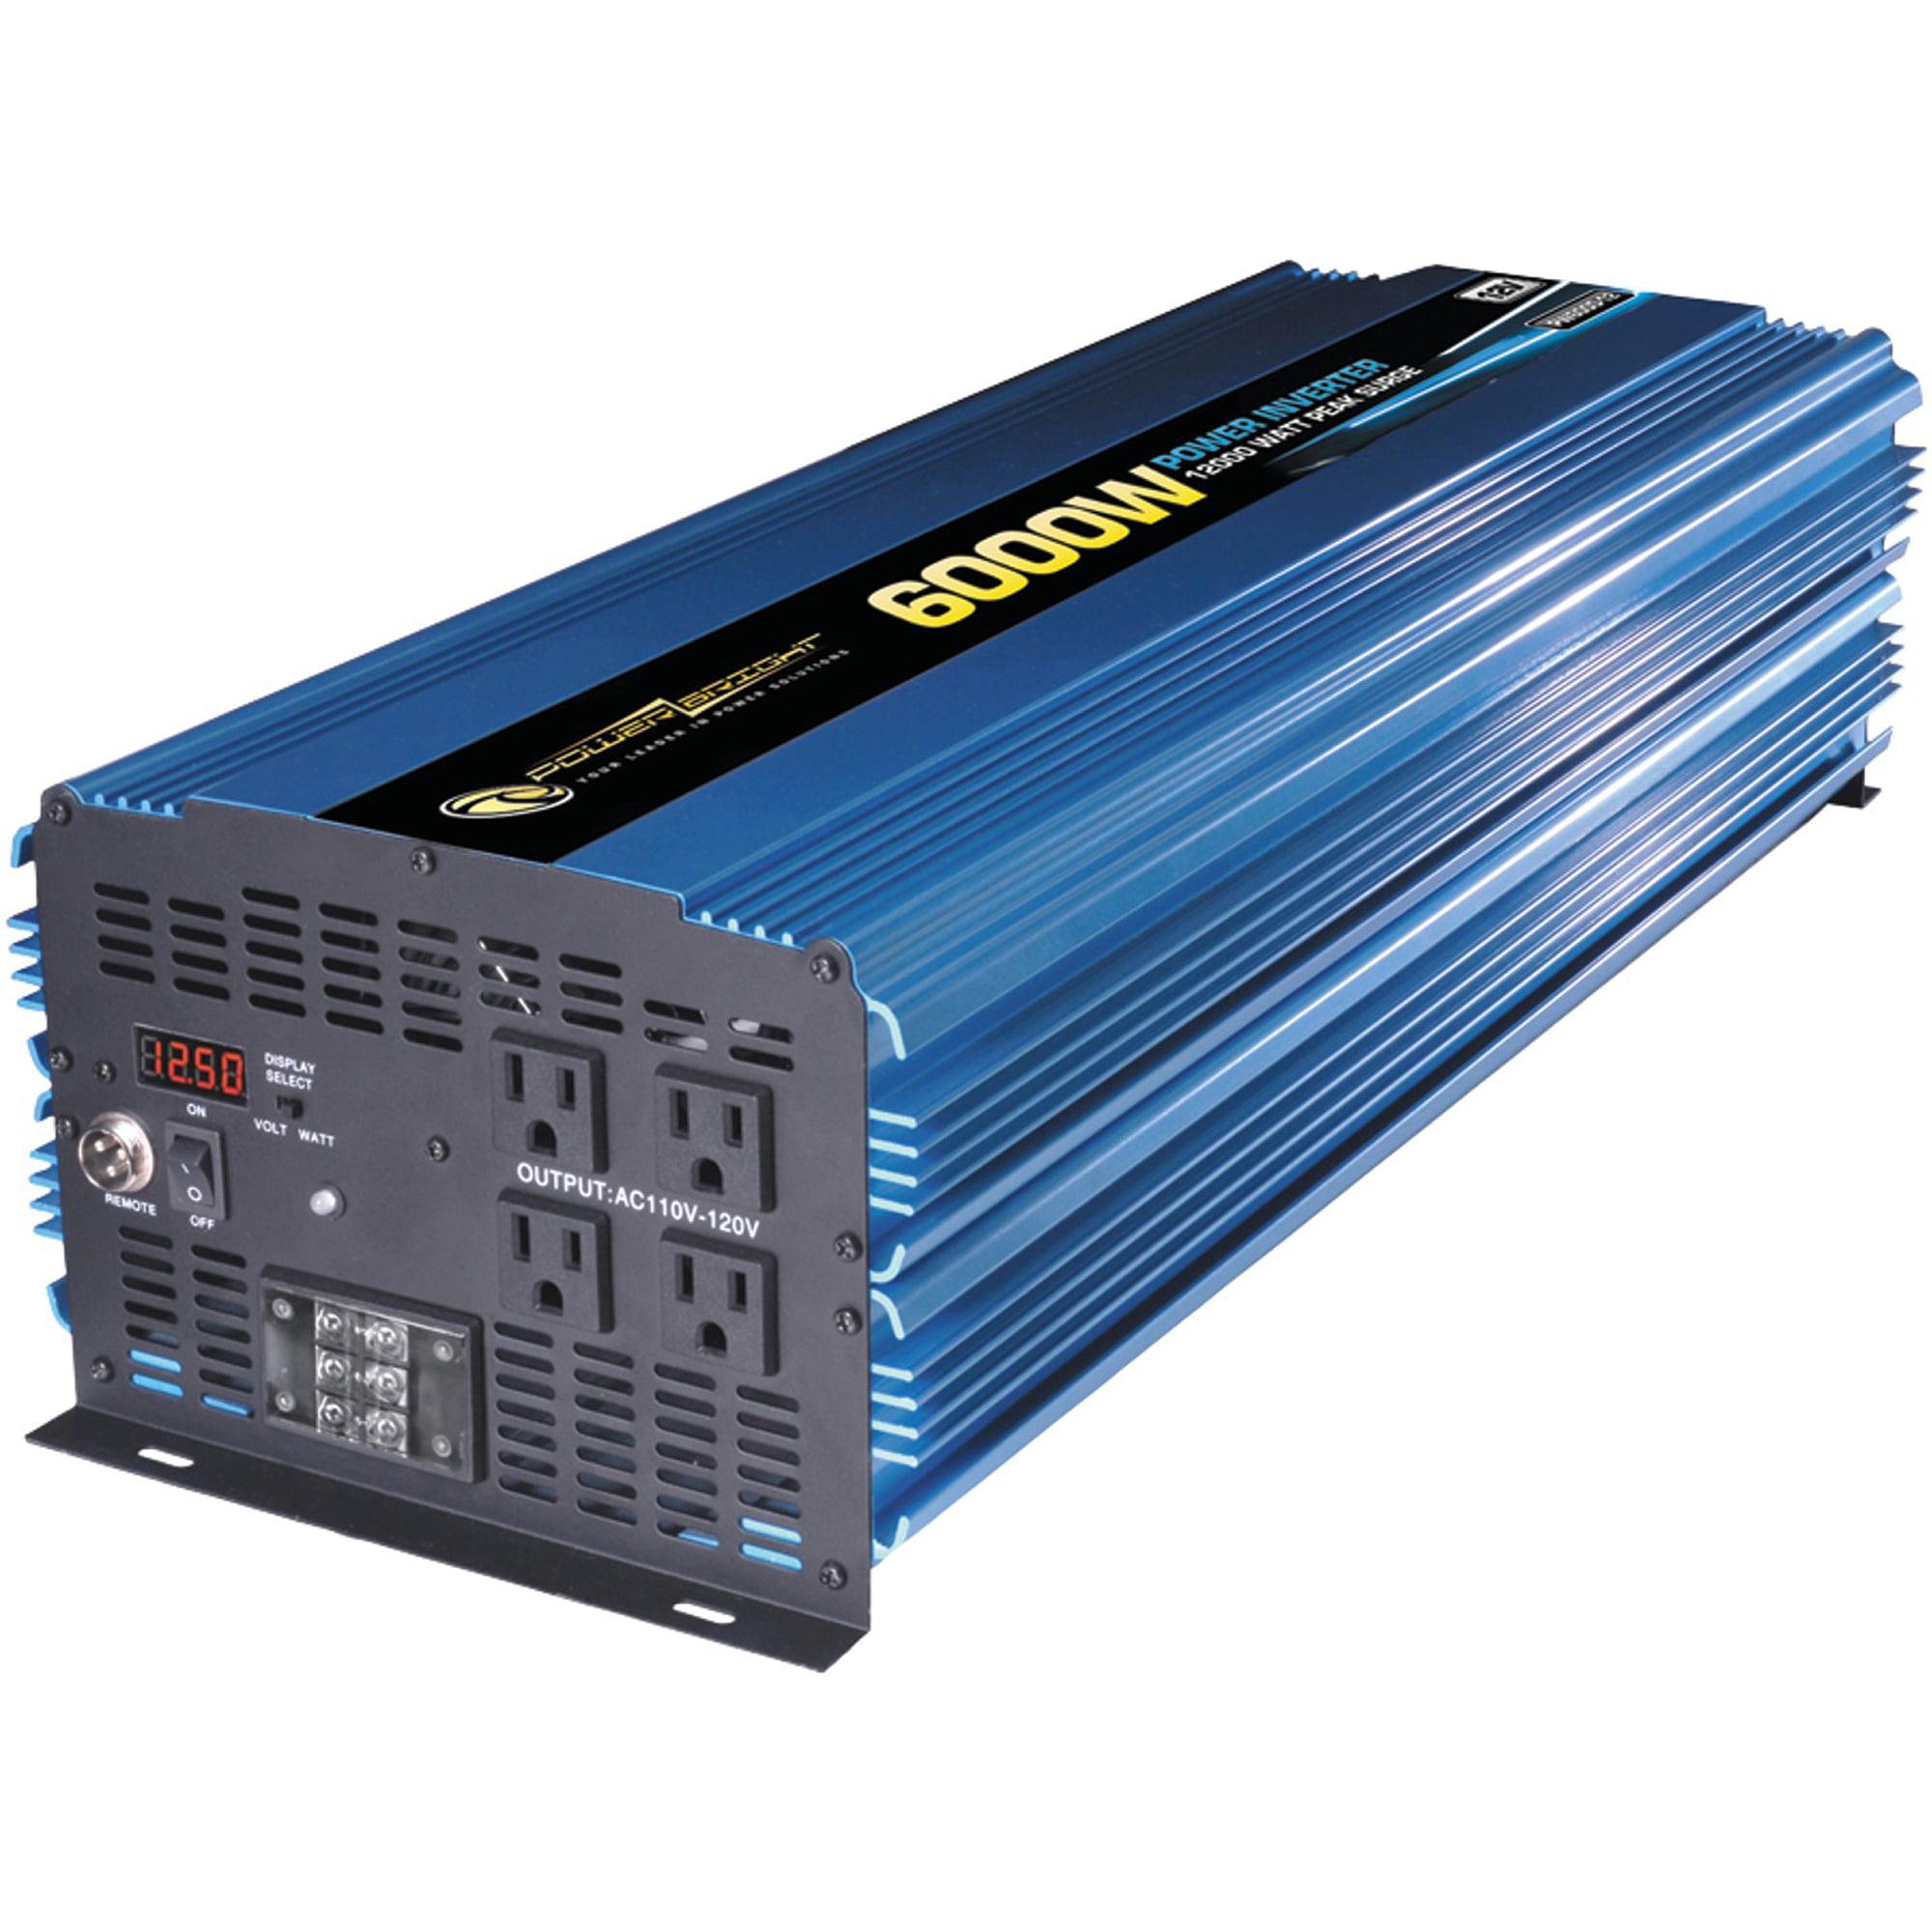 PowerBright PW6000-12 12-Volt Modified Sine Wave Inverter, 6,000 Watts